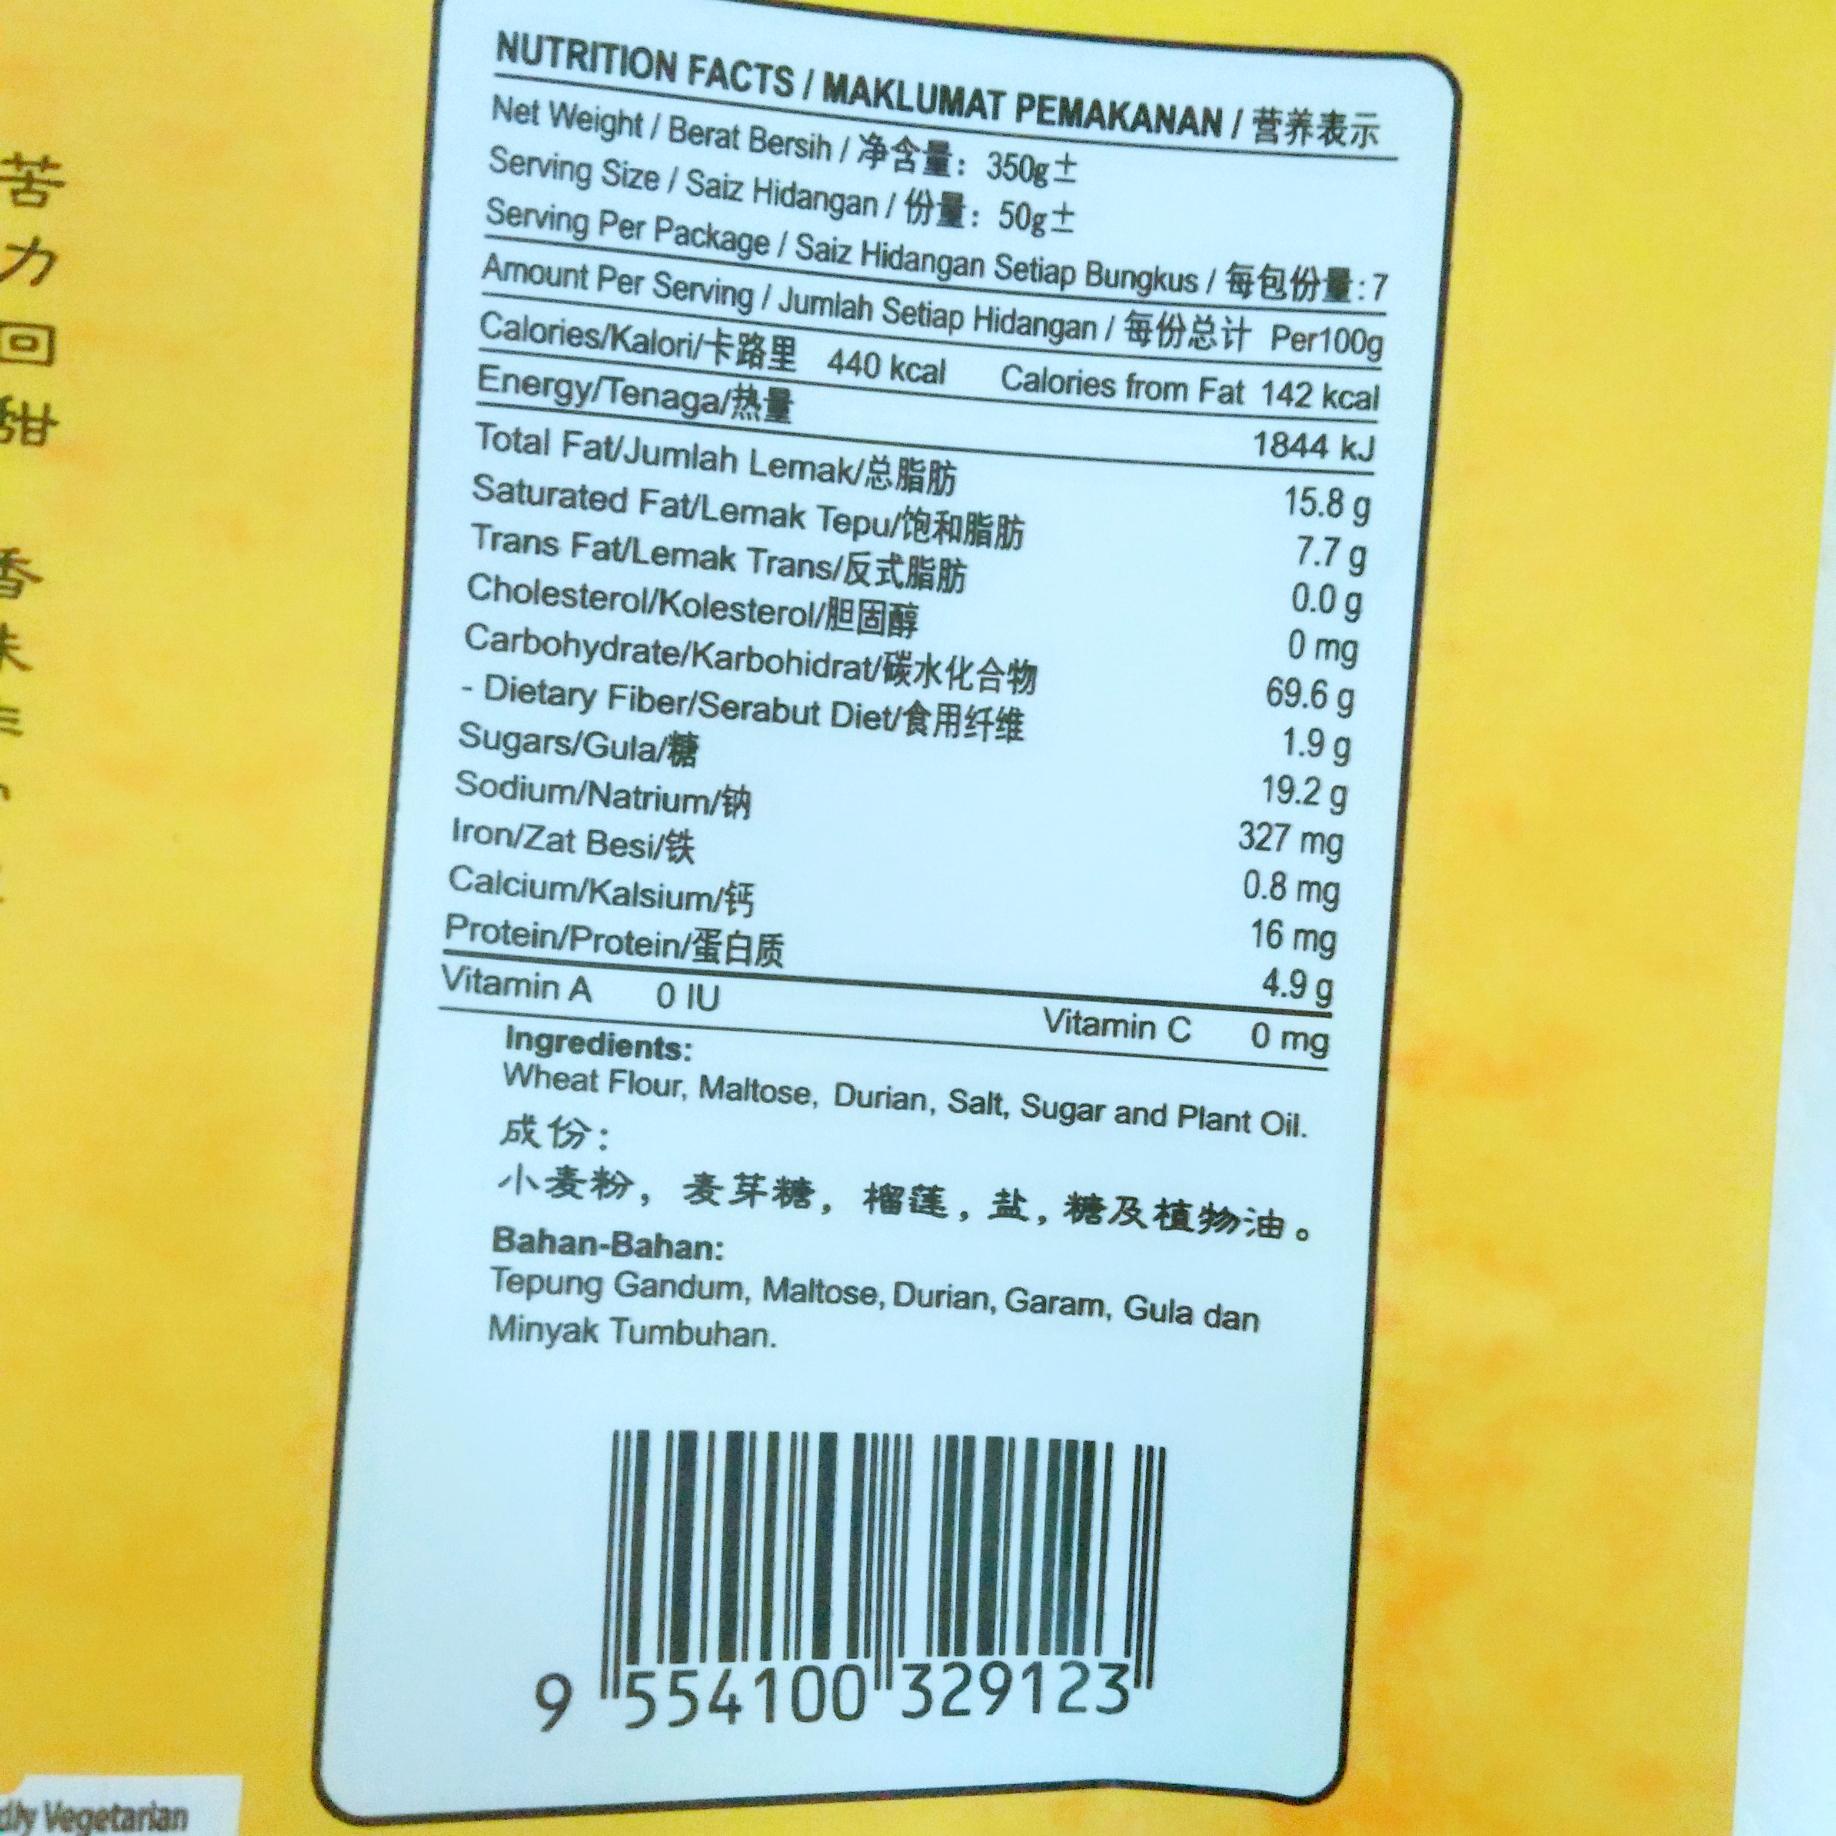 Image Durian Heongpeah 回味 - 榴莲王香饼 (7粒)280 grams